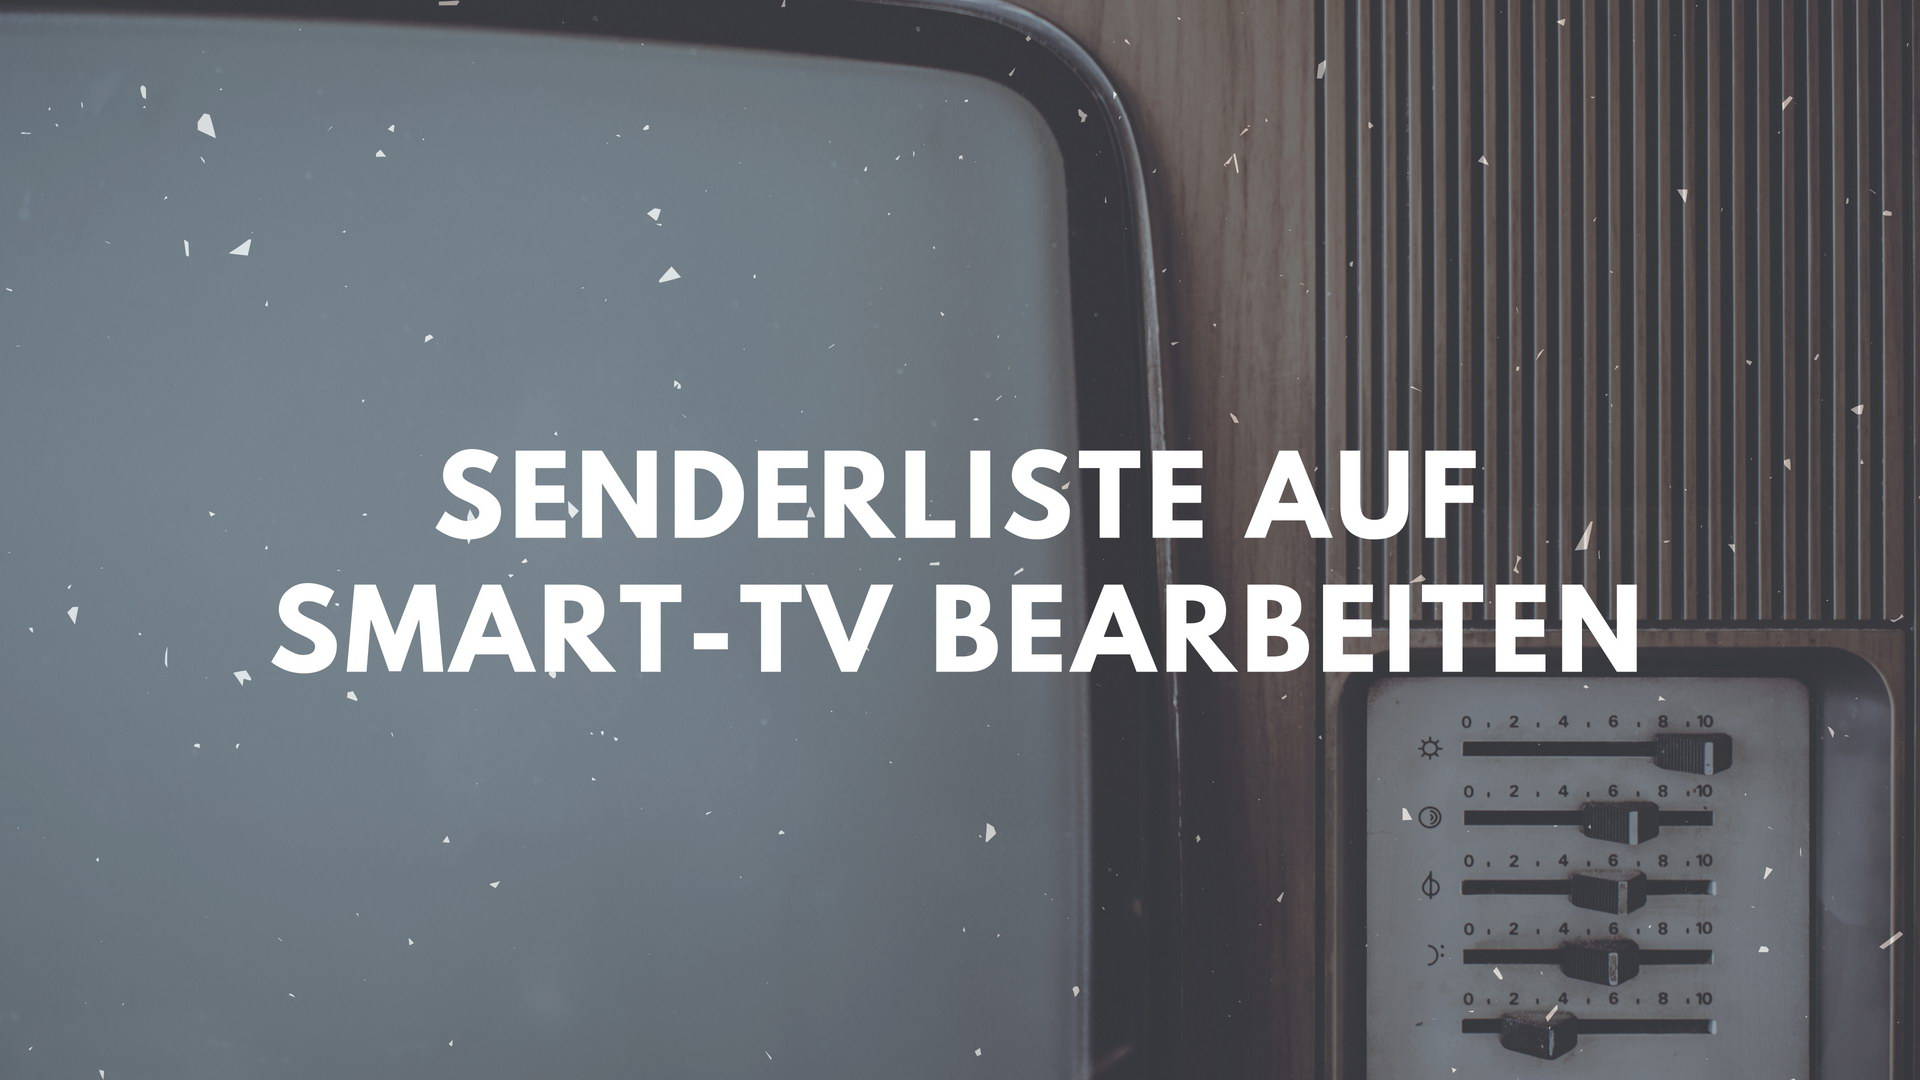 Senderliste auf Smart TV bearbeiten